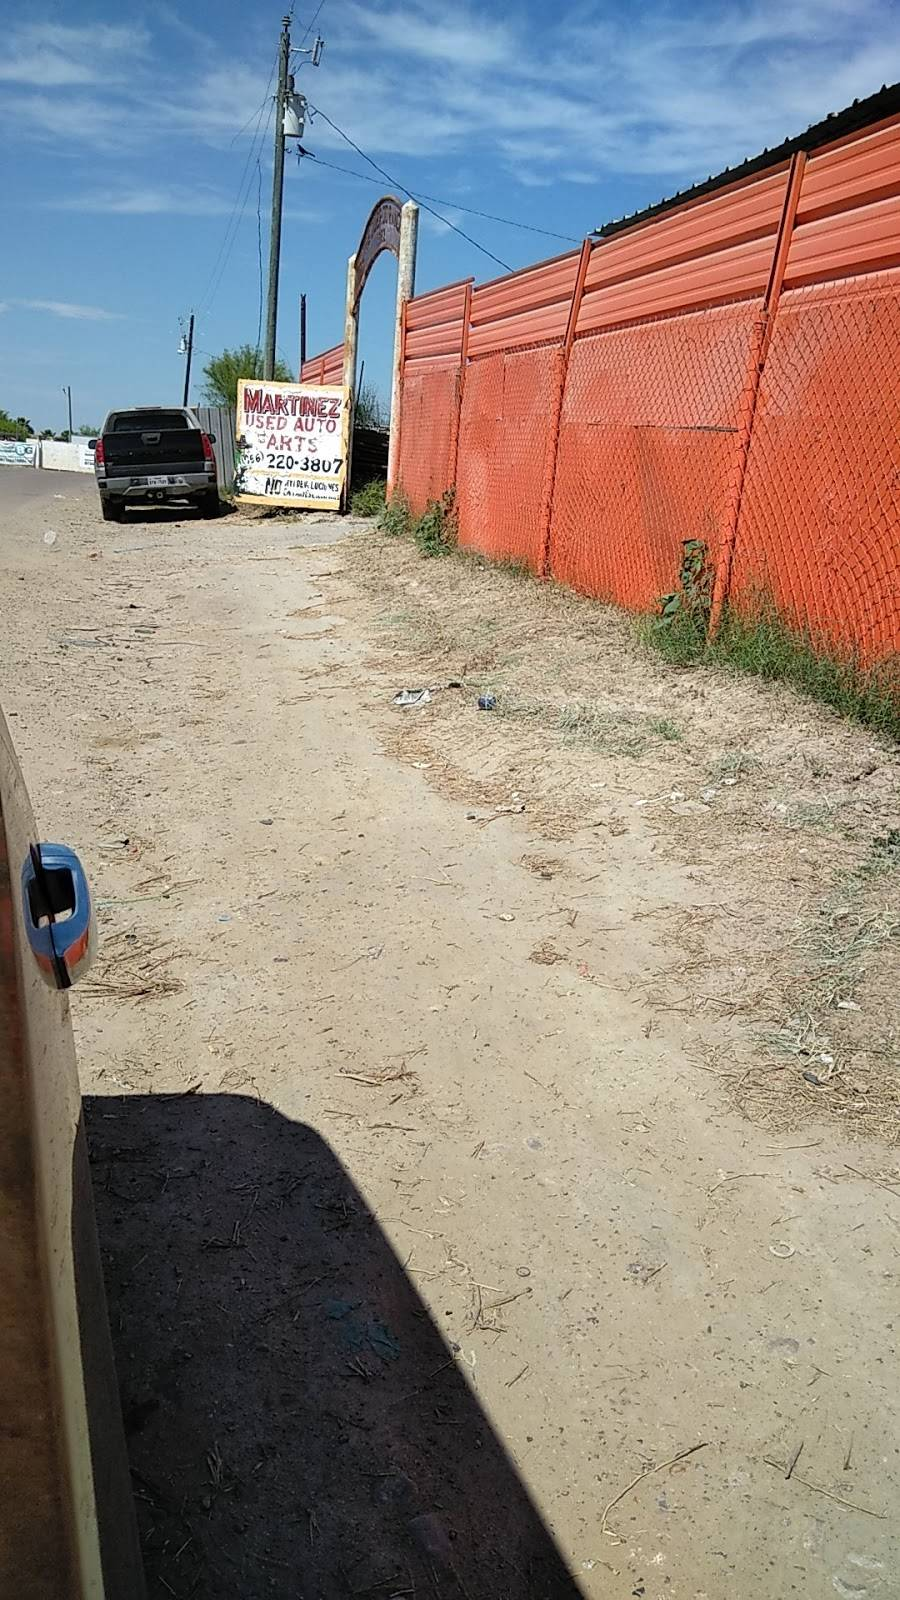 Martinez Used Auto Parts - car repair  | Photo 1 of 1 | Address: Riata Road, Laredo, TX 78043, USA | Phone: (956) 220-3807